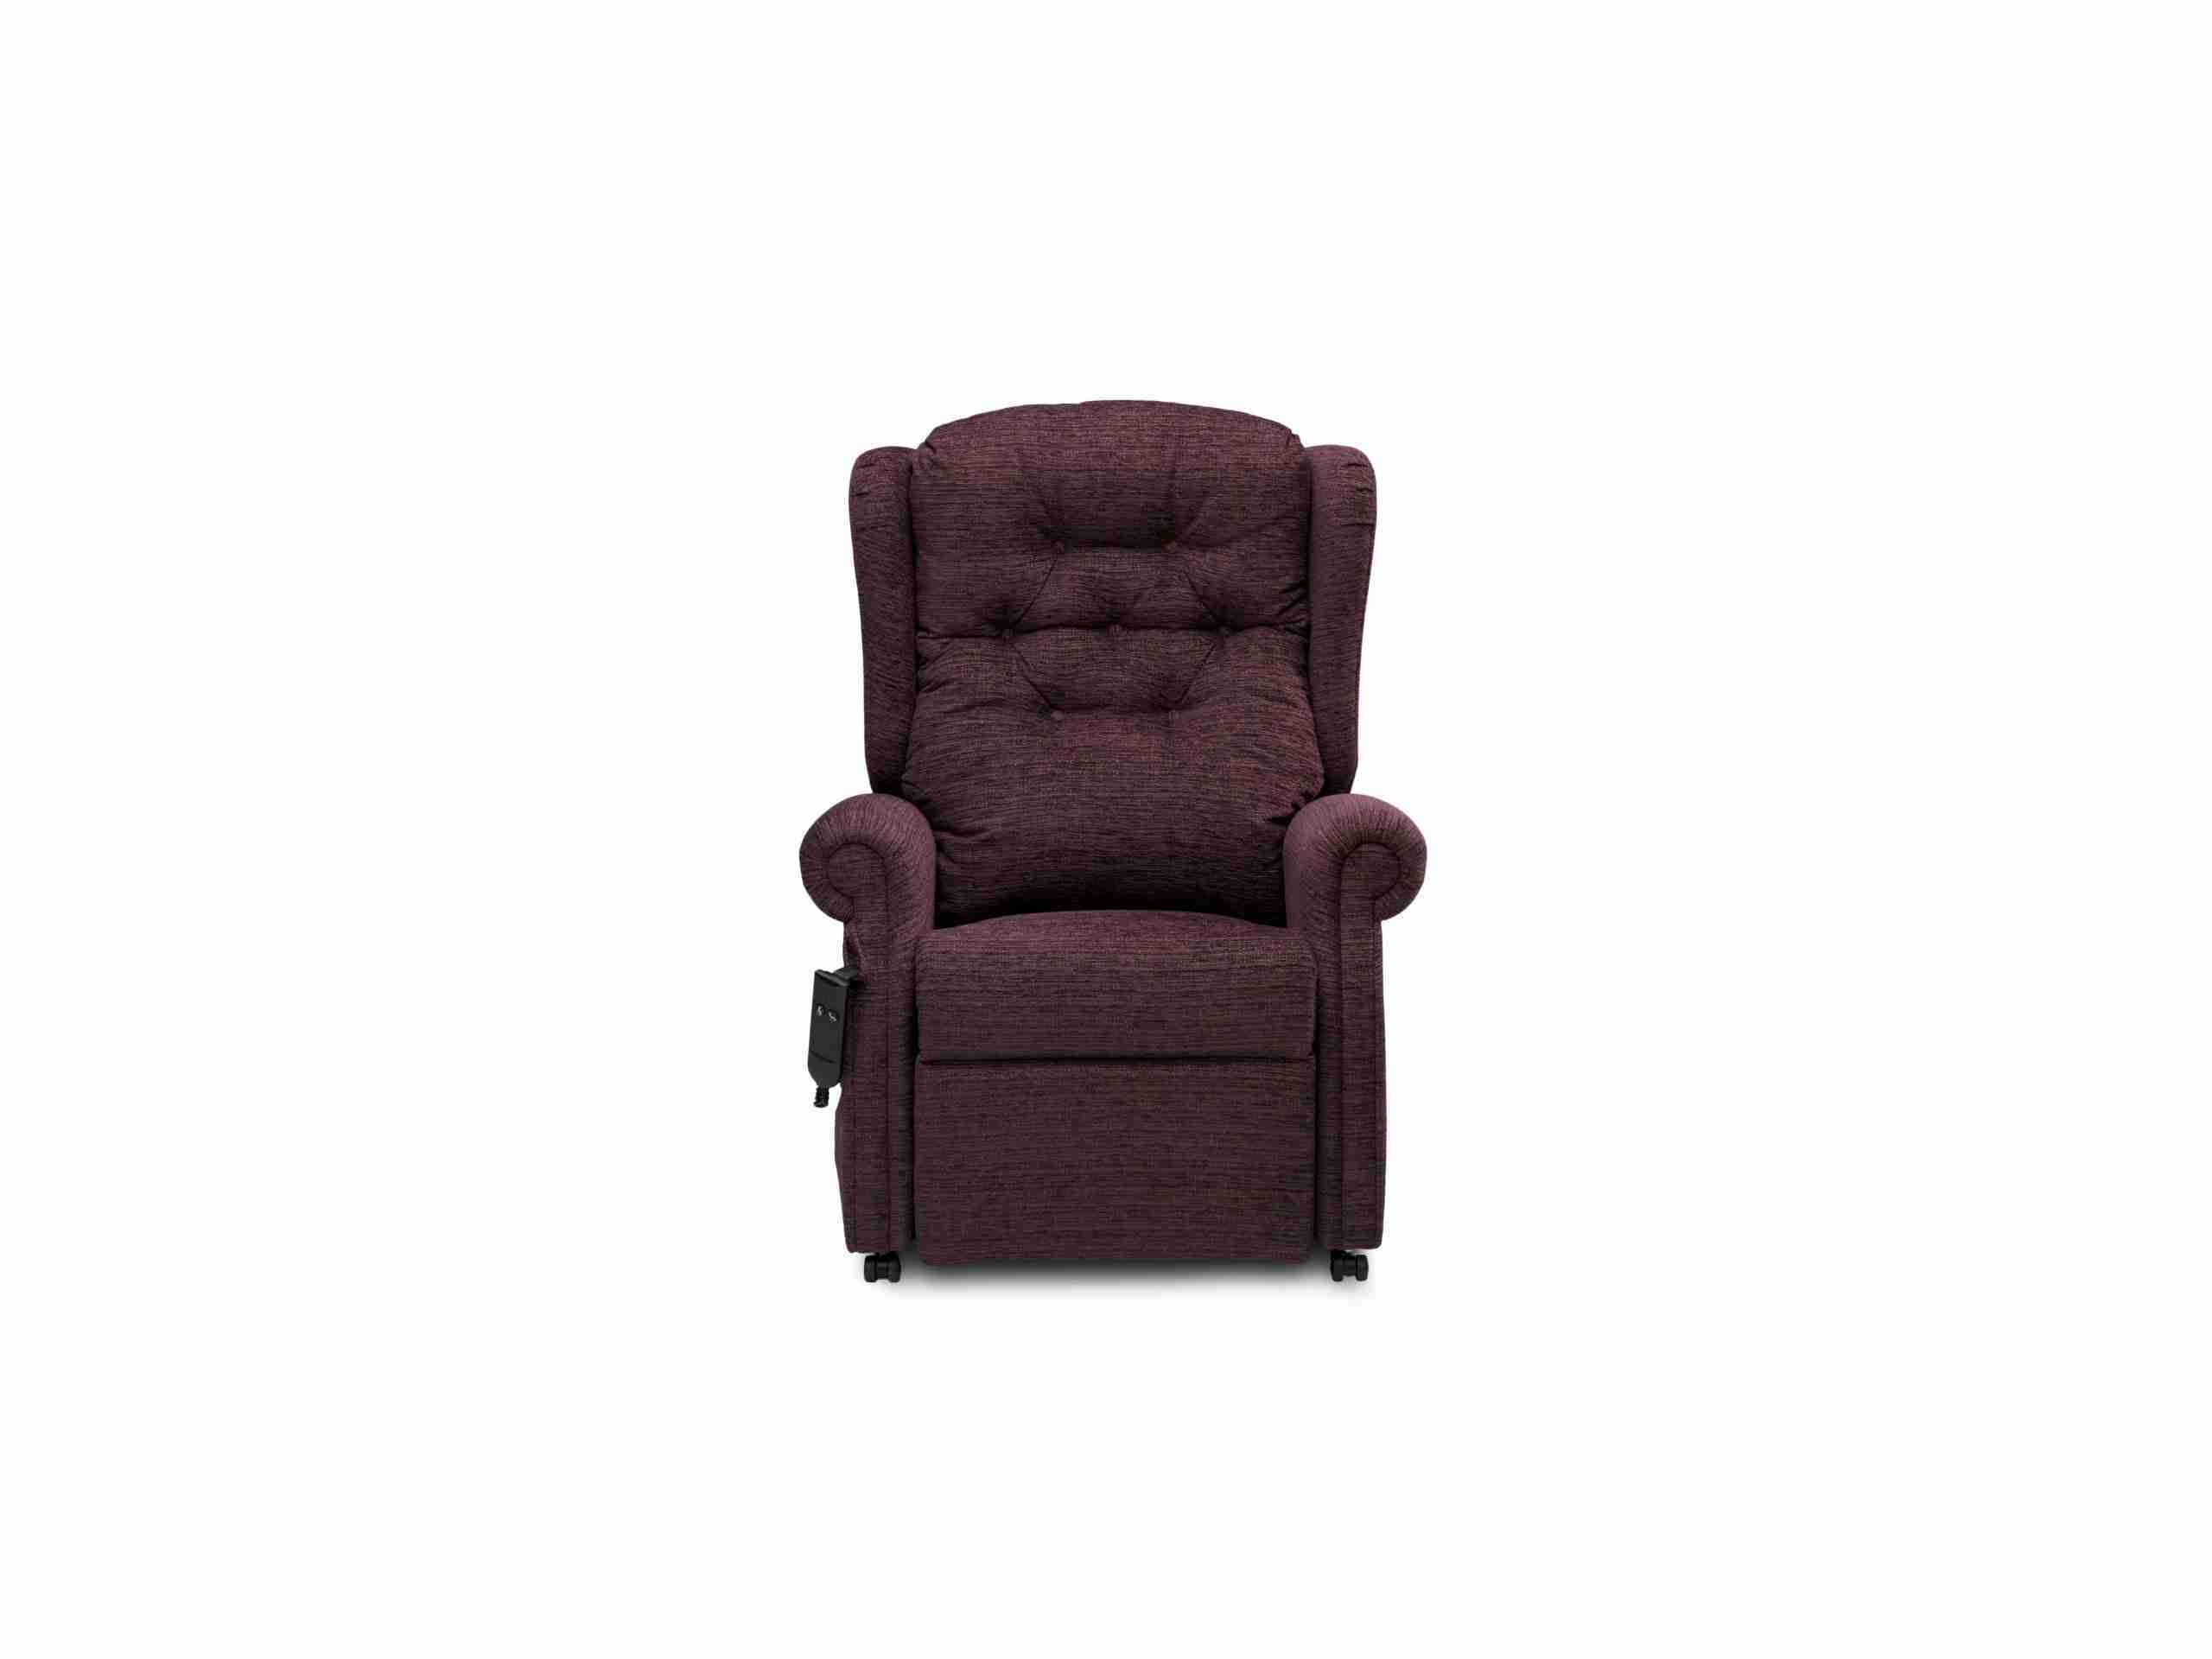 Marbella Chair Repose01